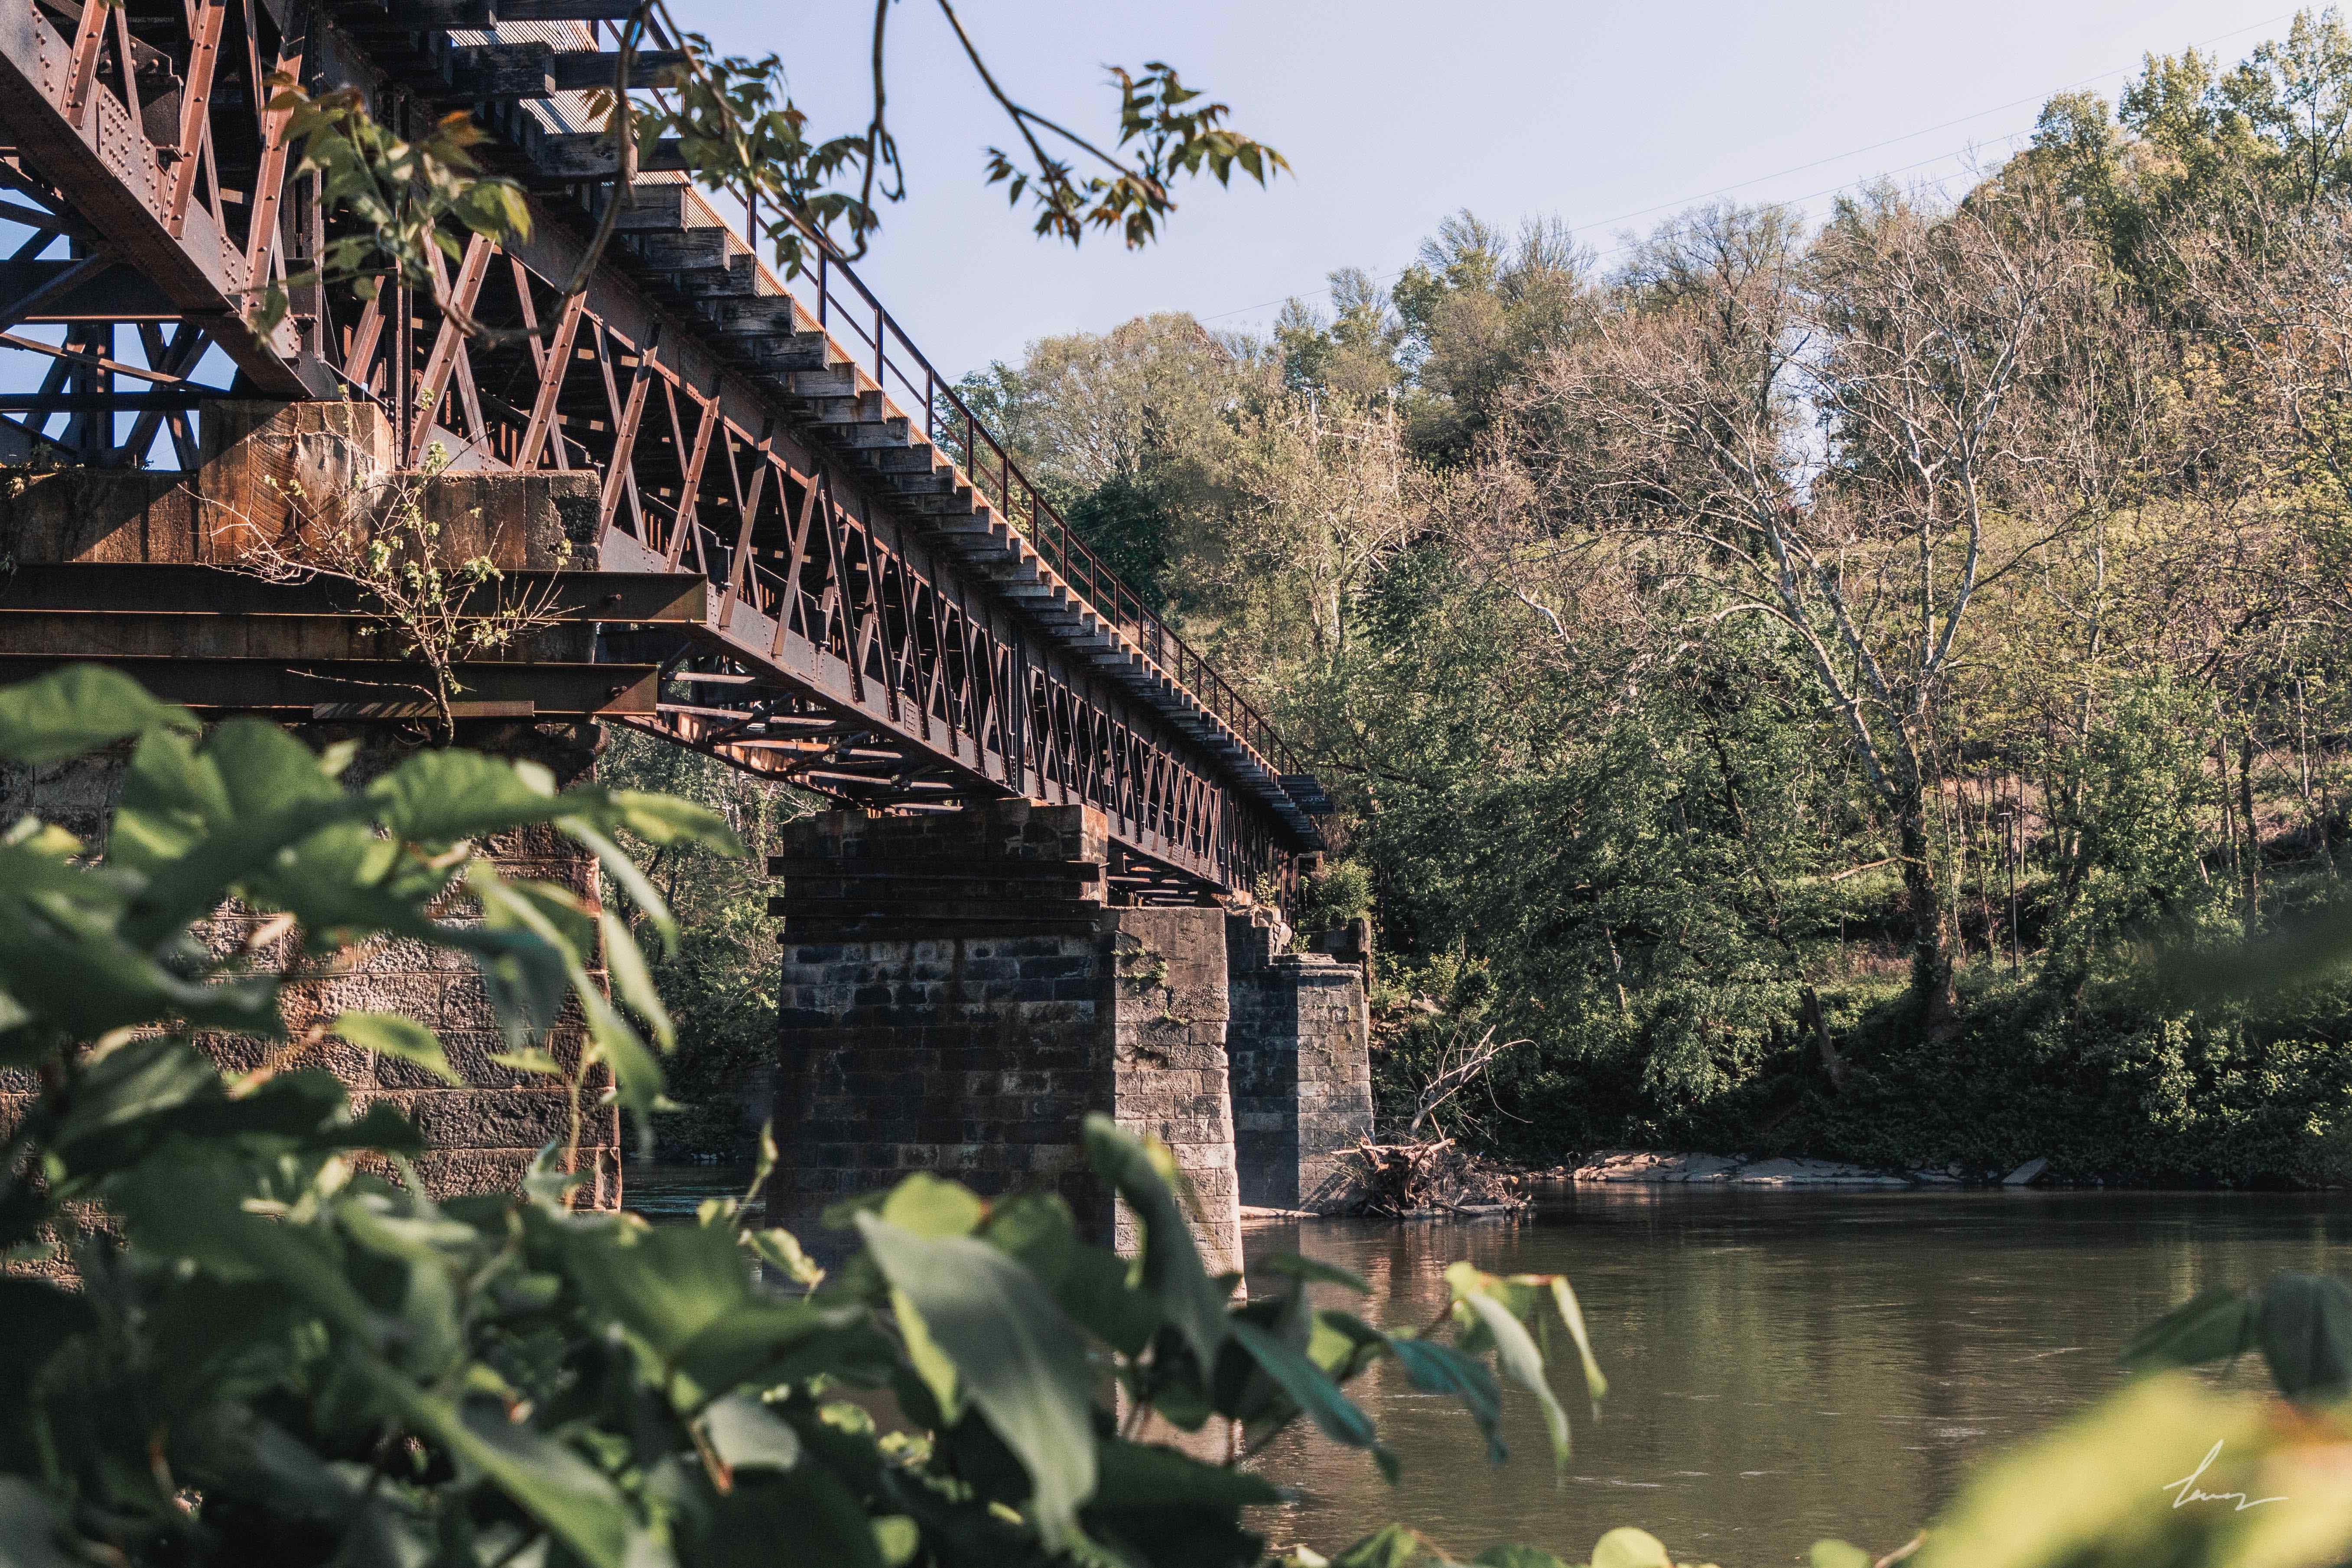 Rail Road Bridge - Manayunk, Pennsylvania